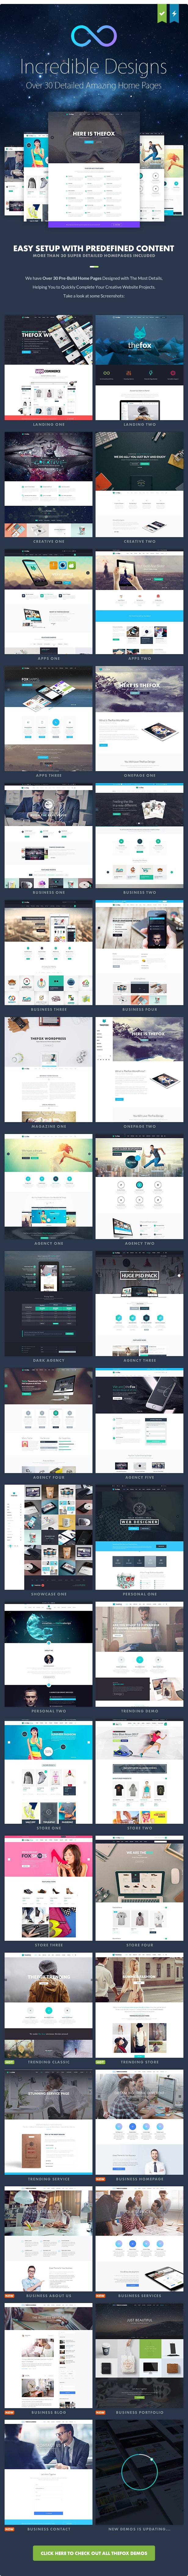 TheFox WordPress Theme Incredible Designs - TheFox   Responsive Multi-Purpose WordPress Theme